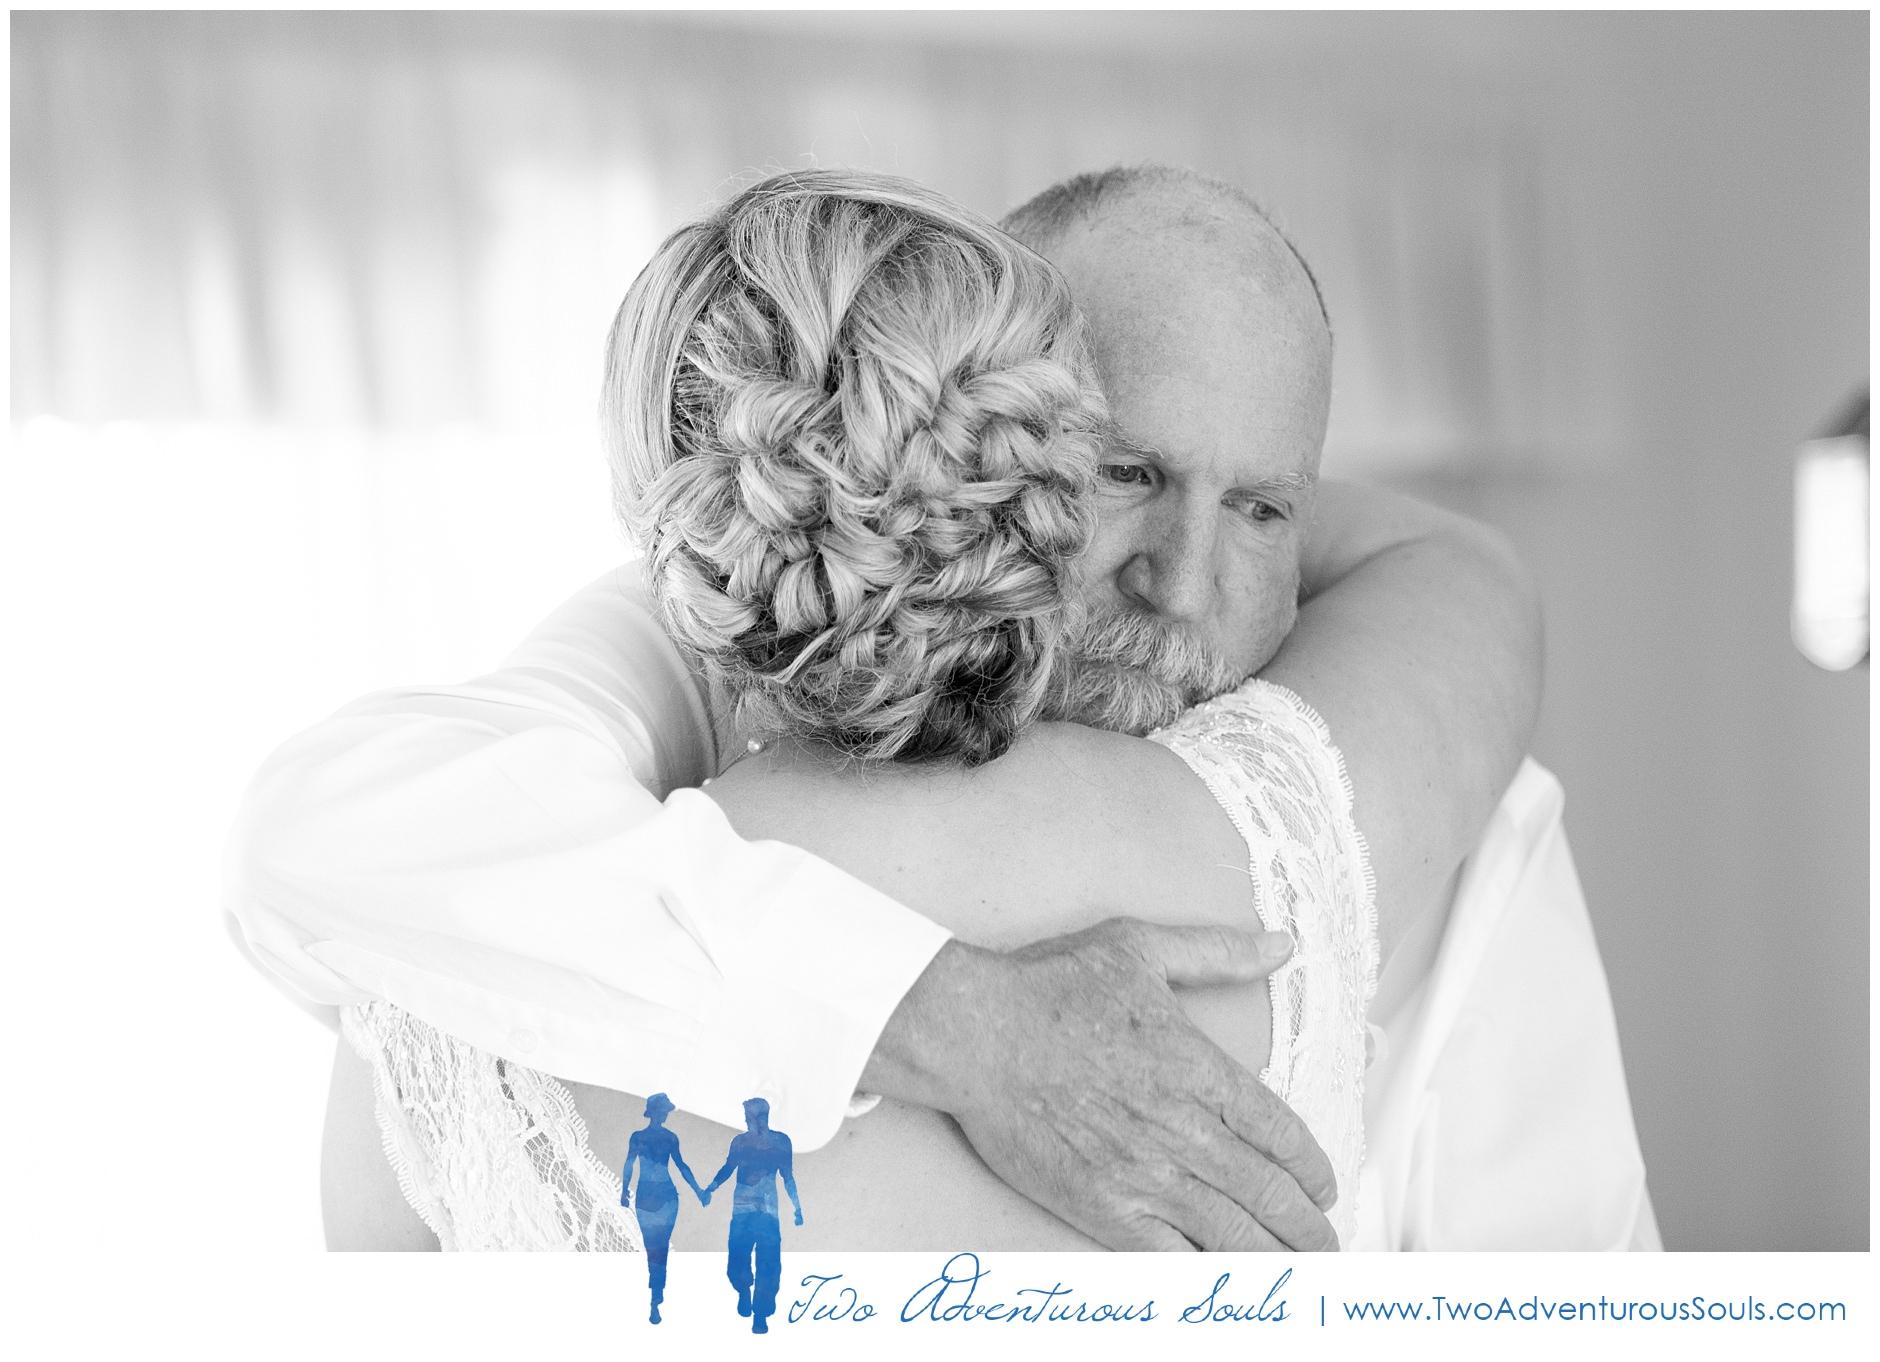 Cape Cod Wedding Photographers, Destination Wedding Photographers, Two Adventurous Souls-081019_0011.jpg